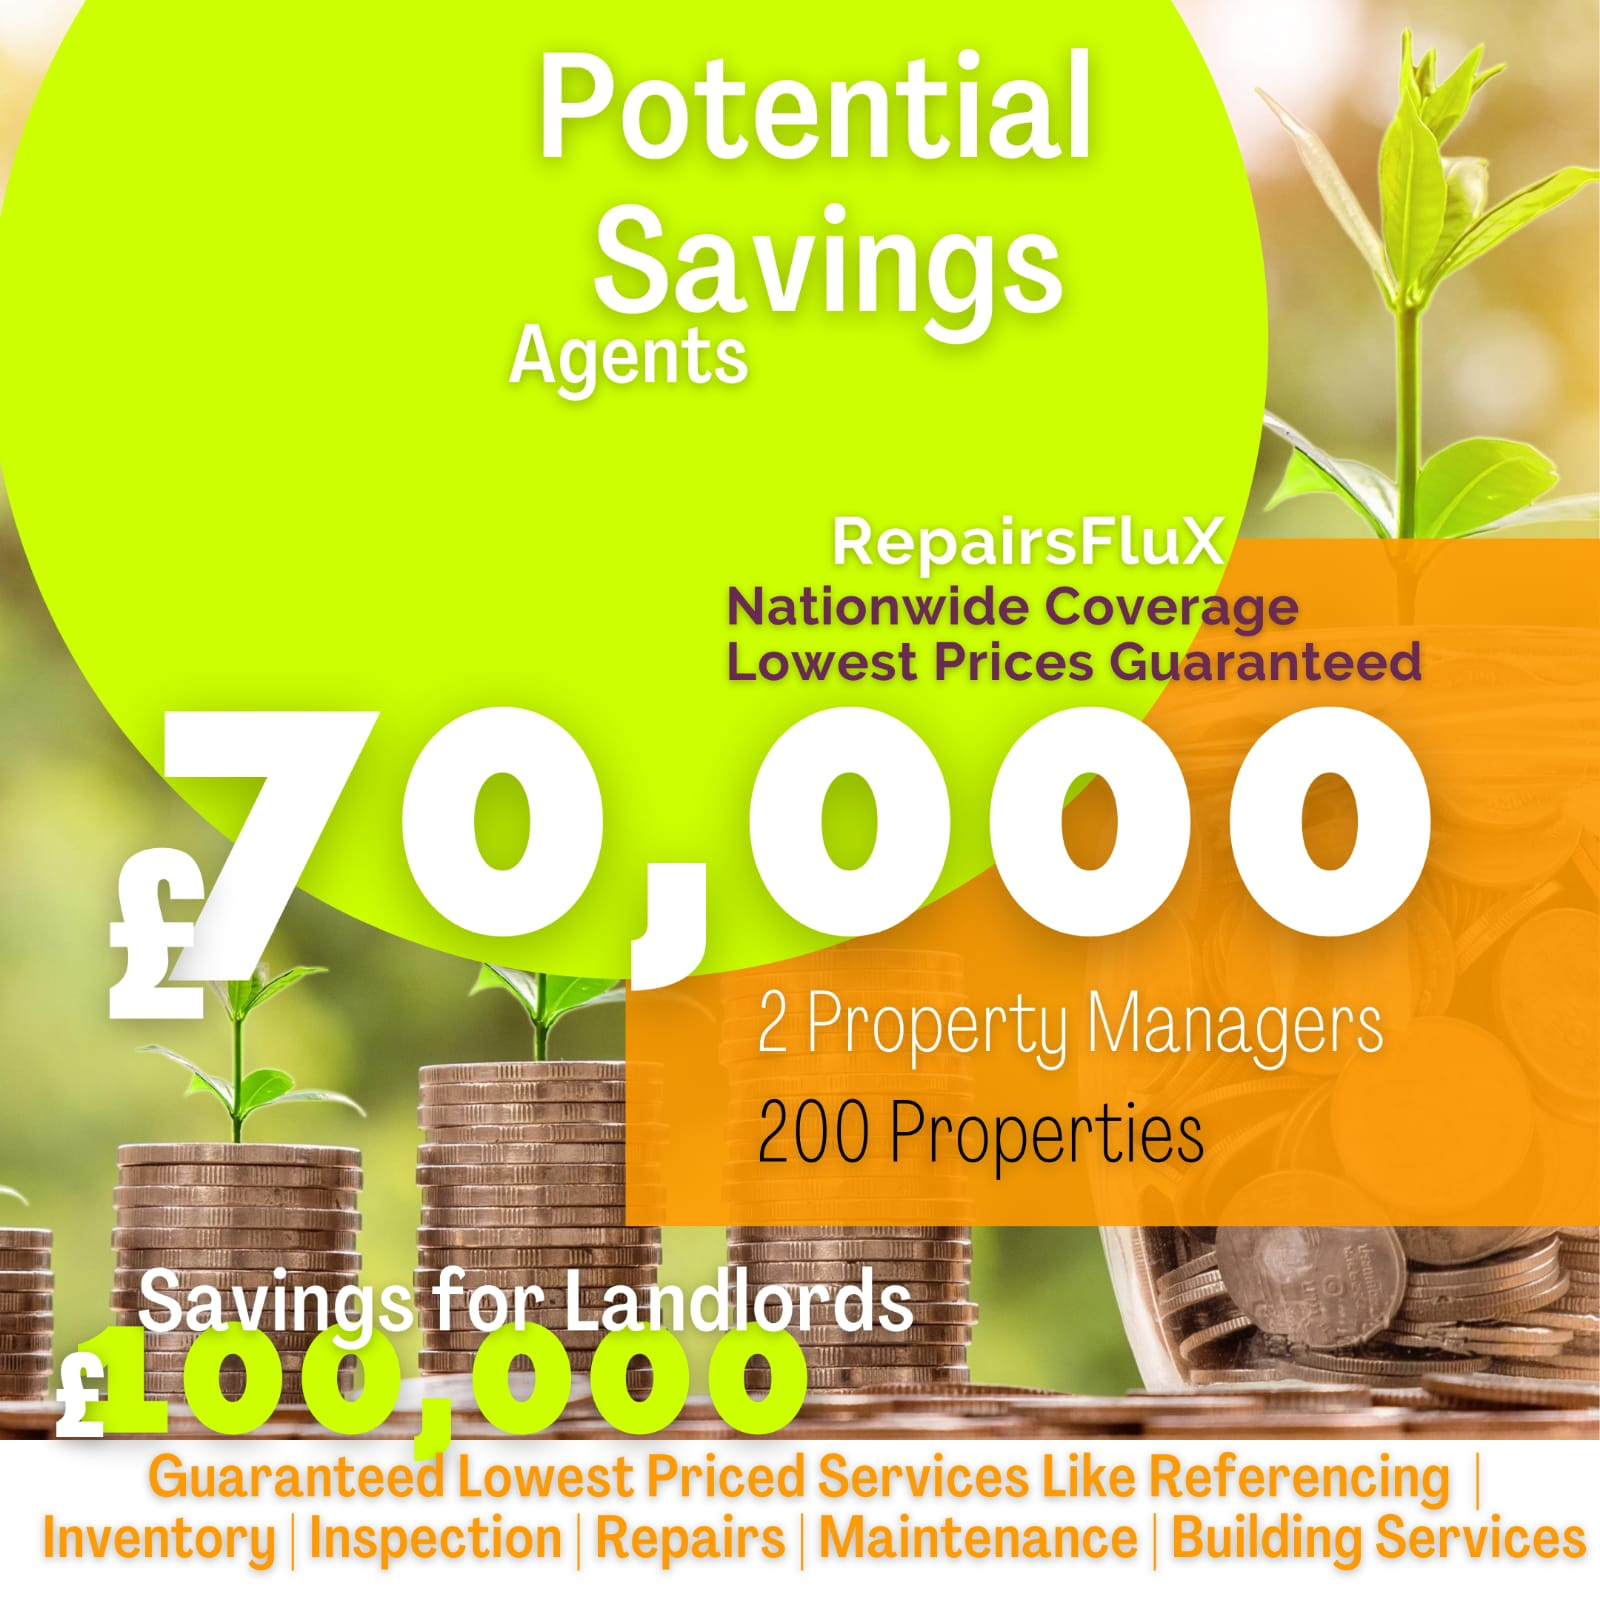 RepairsFluX Savings